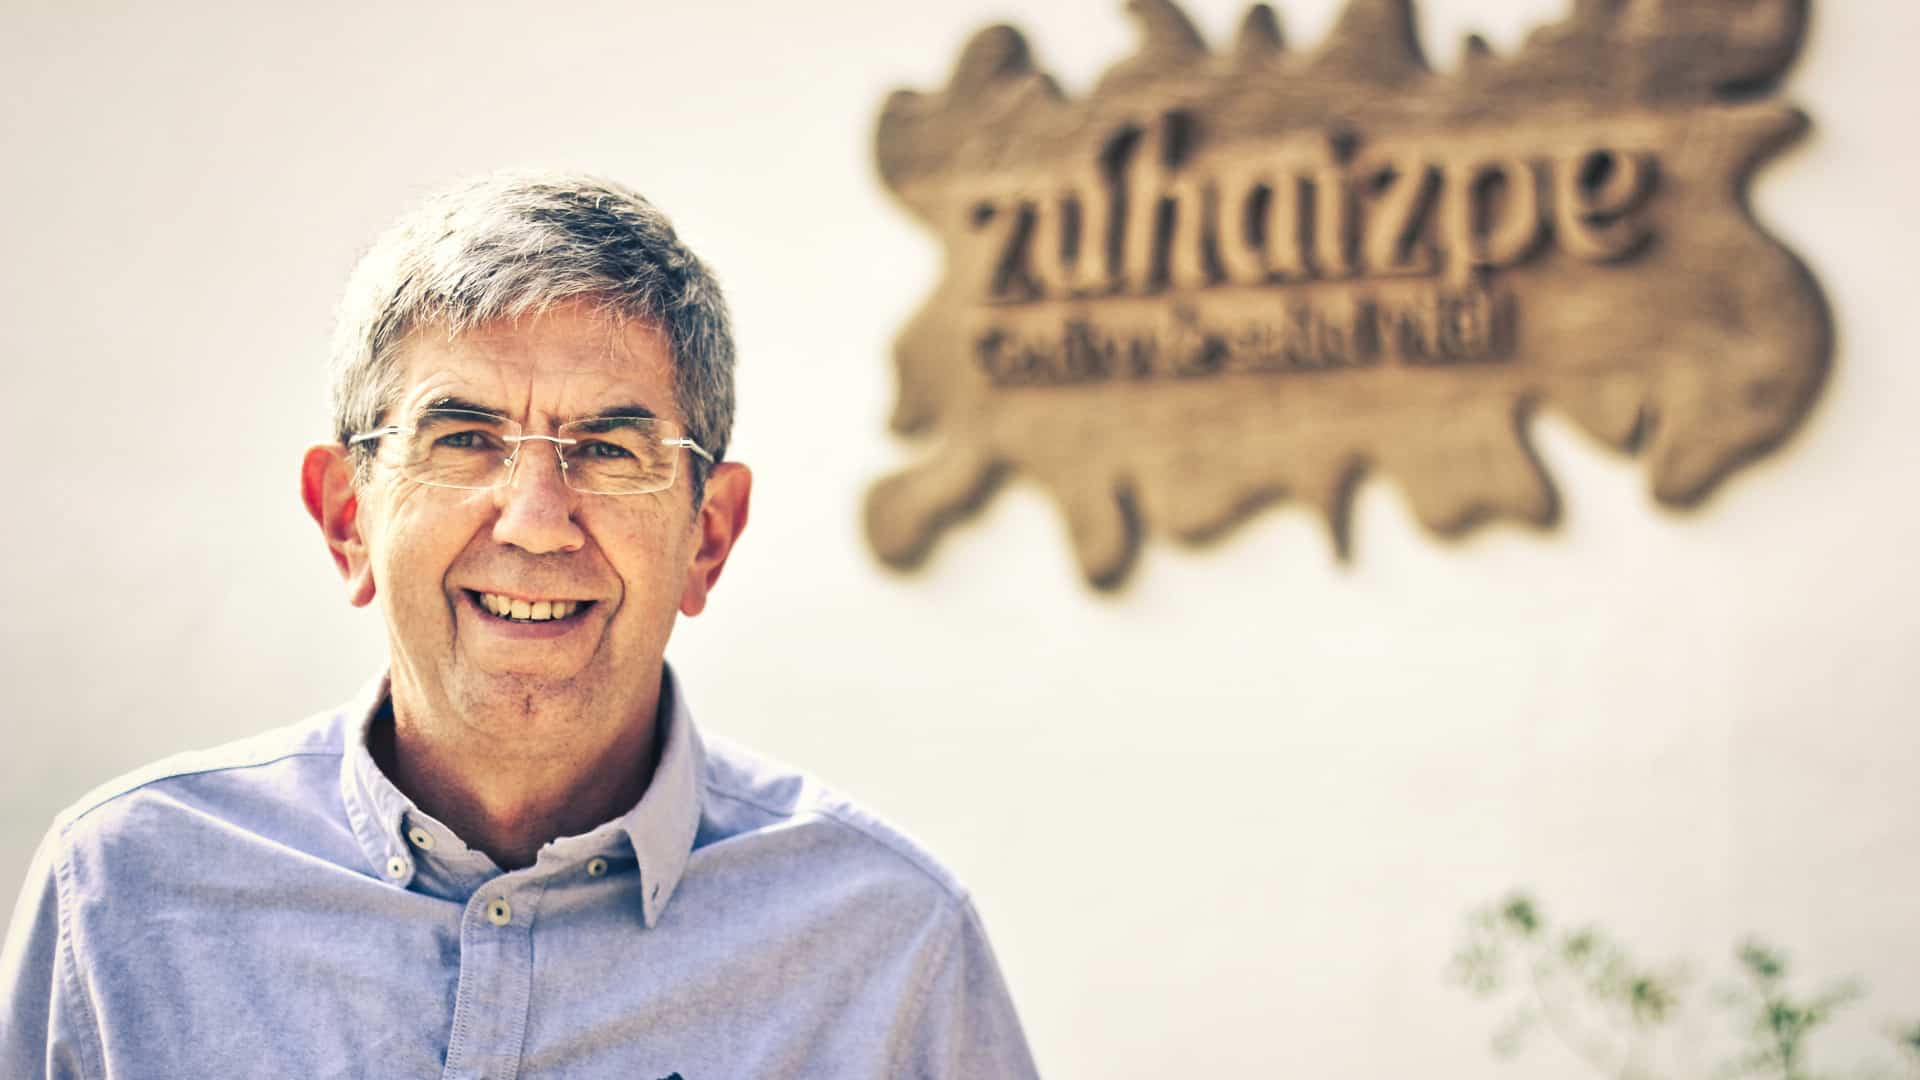 www.zuhaizpe.com